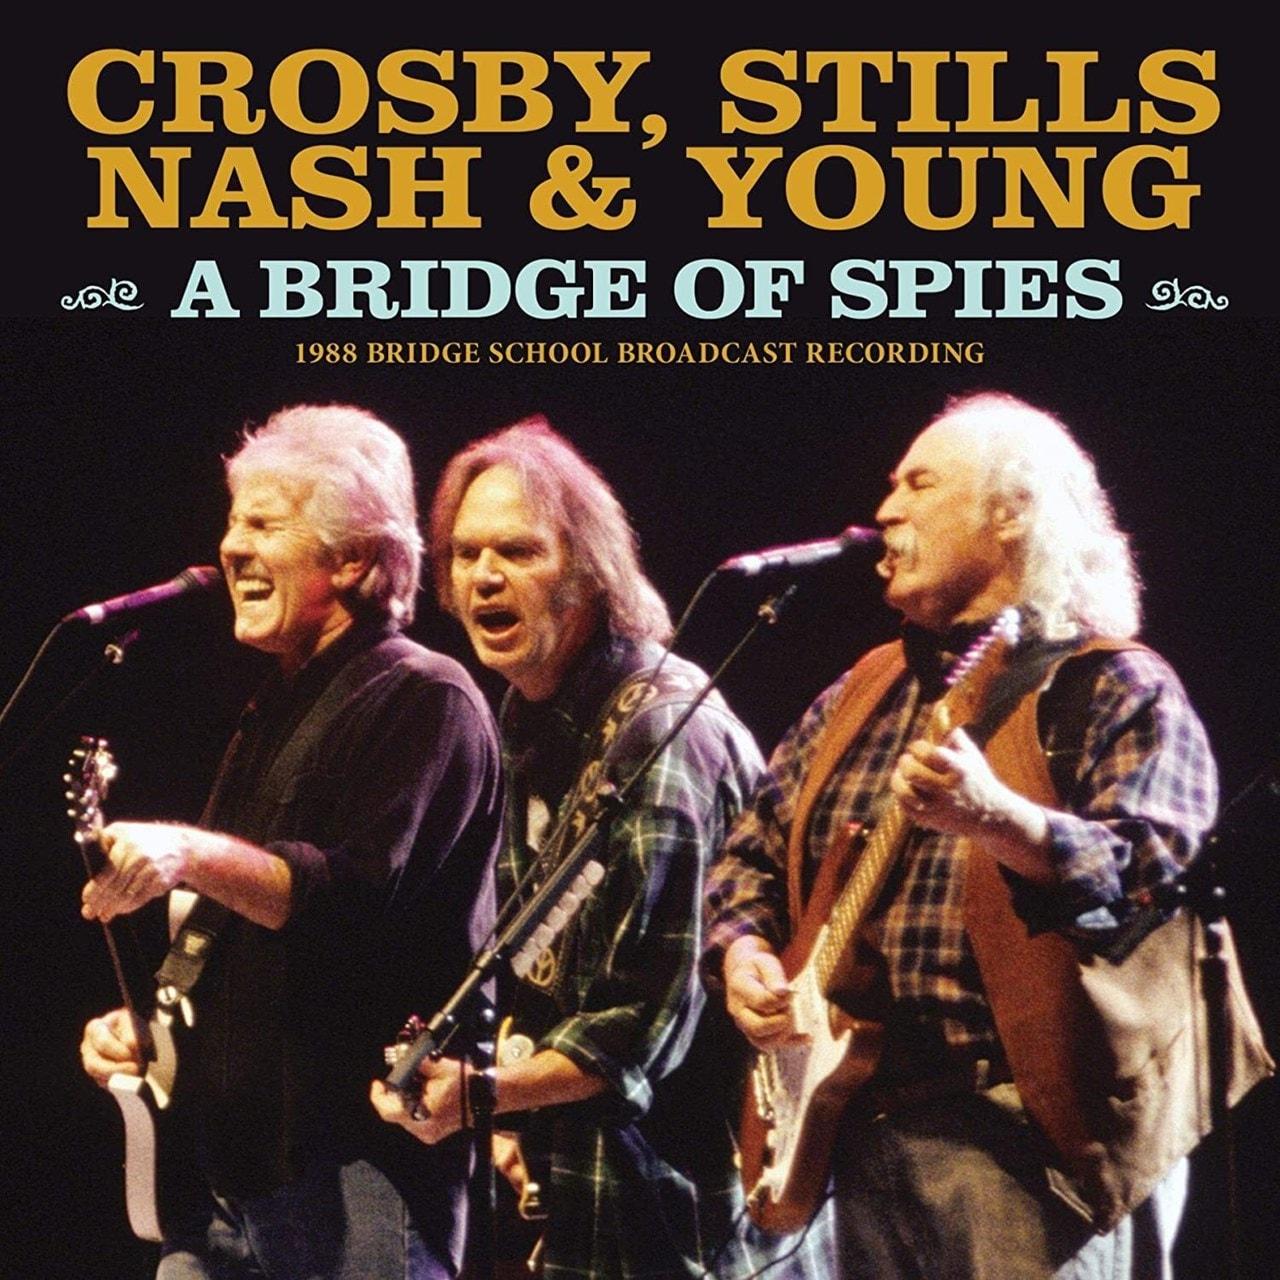 A Bridge of Spies: 1988 Bridge School Broadcast Recording - 1